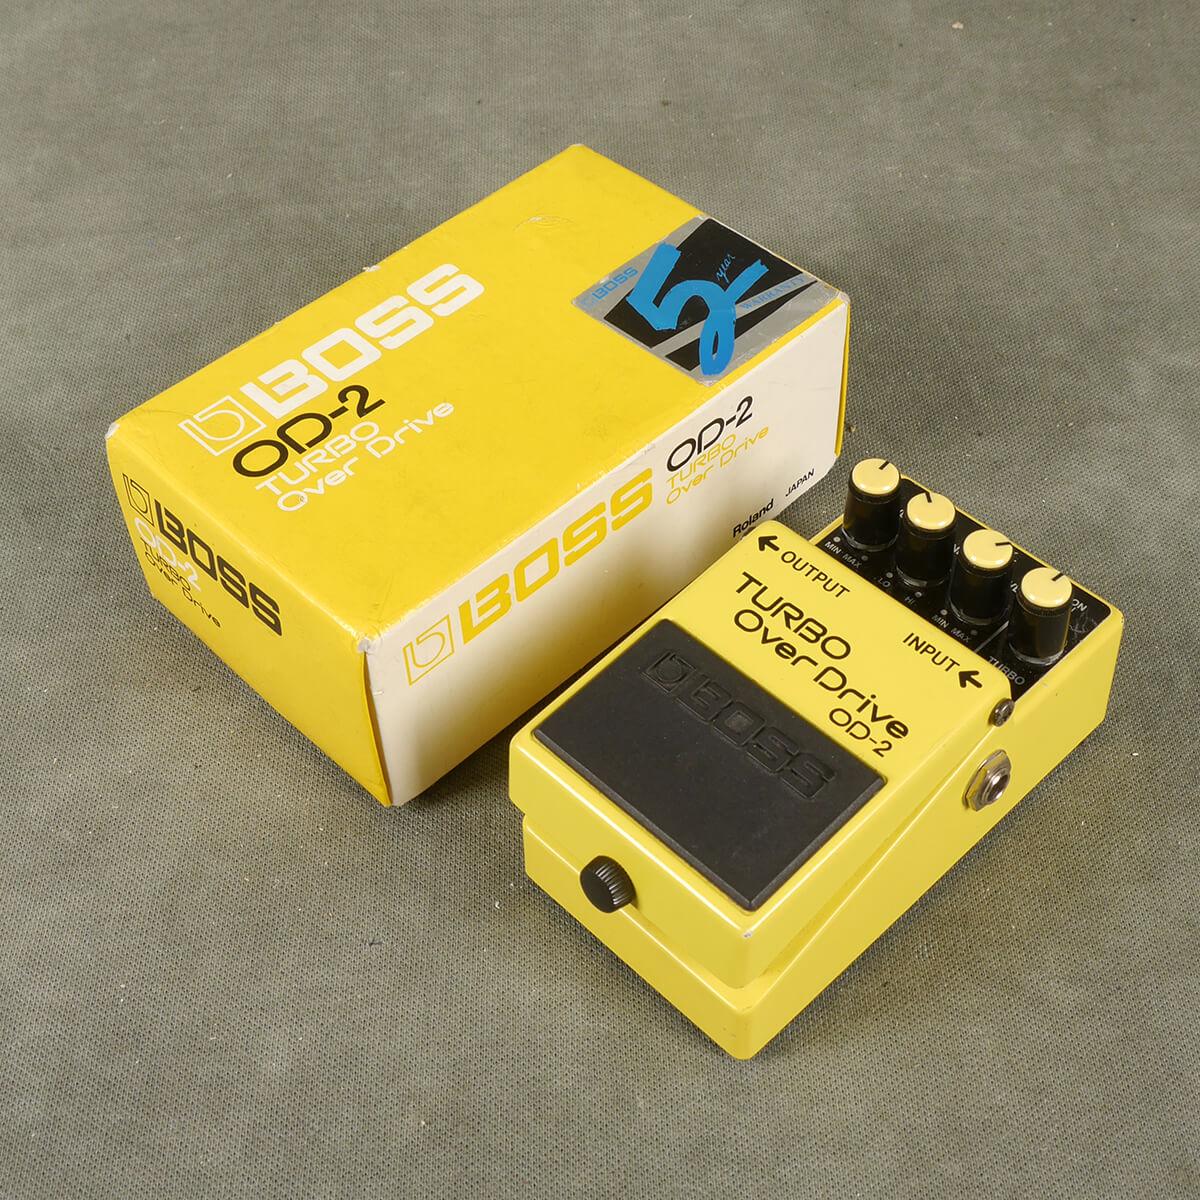 Boss MIJ OD-2 Turbo Overdrive FX Pedal w/Box - 2nd Hand